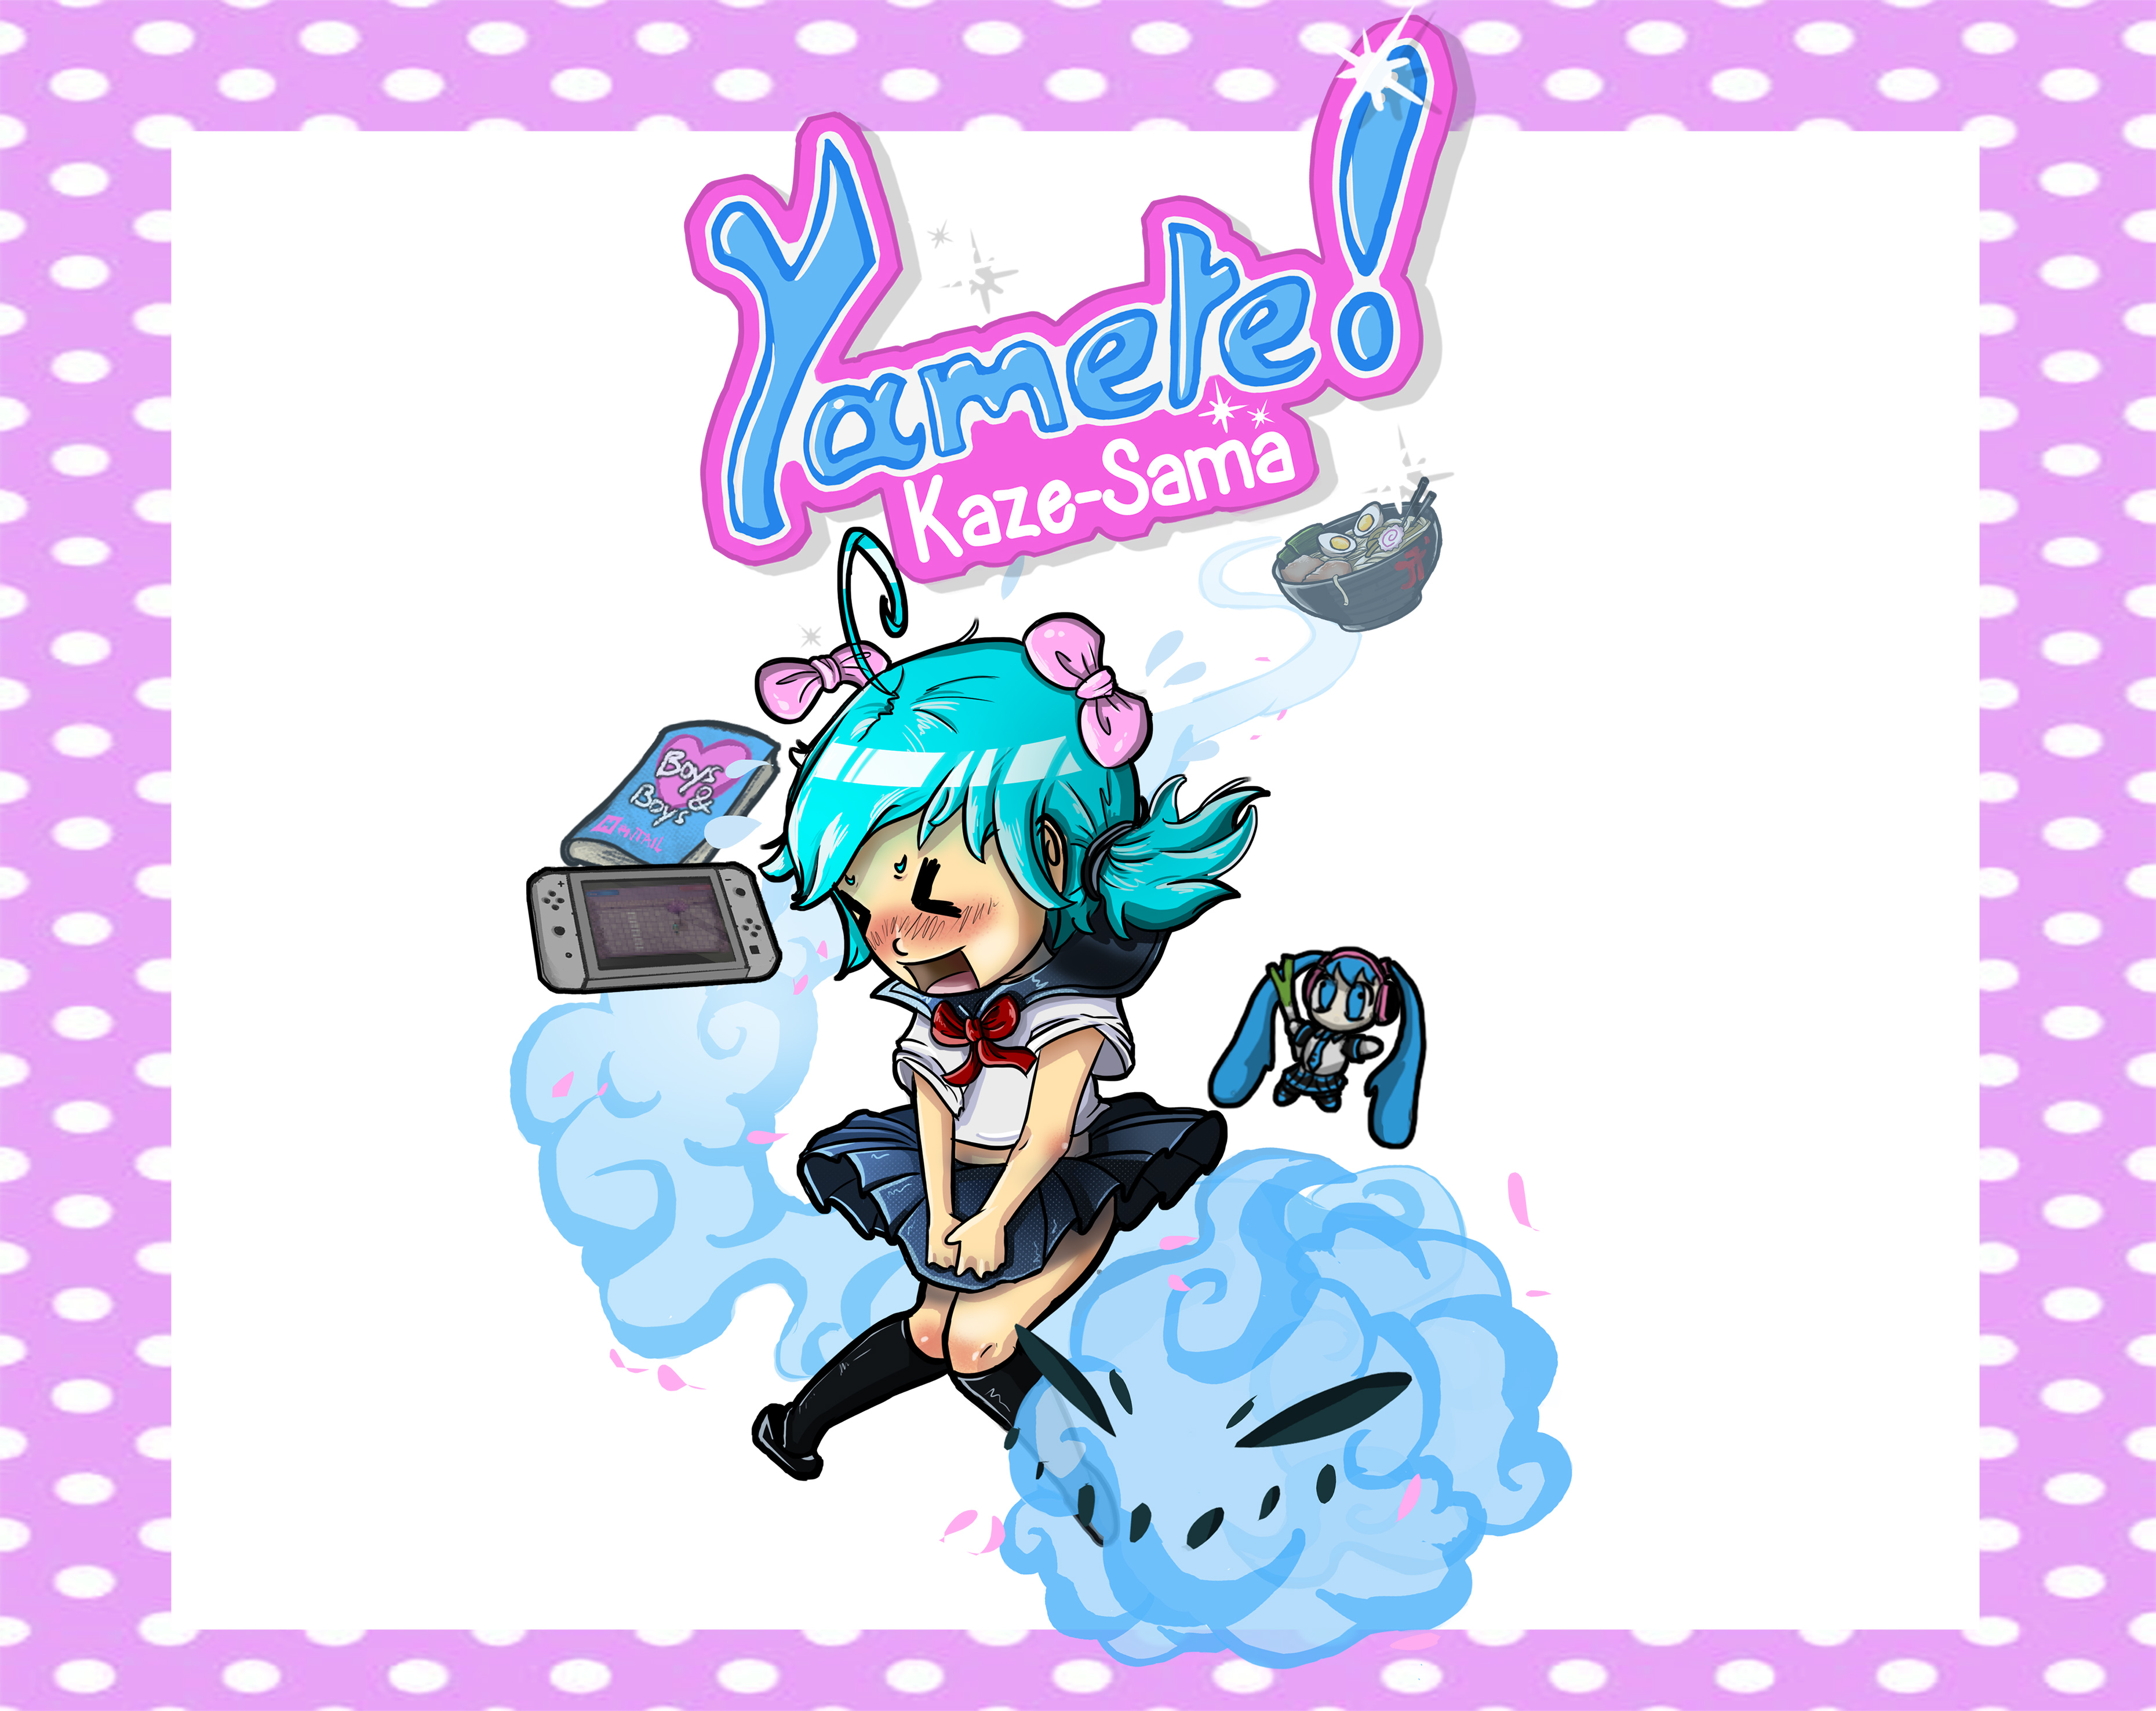 Yamete, Kaze-sama !